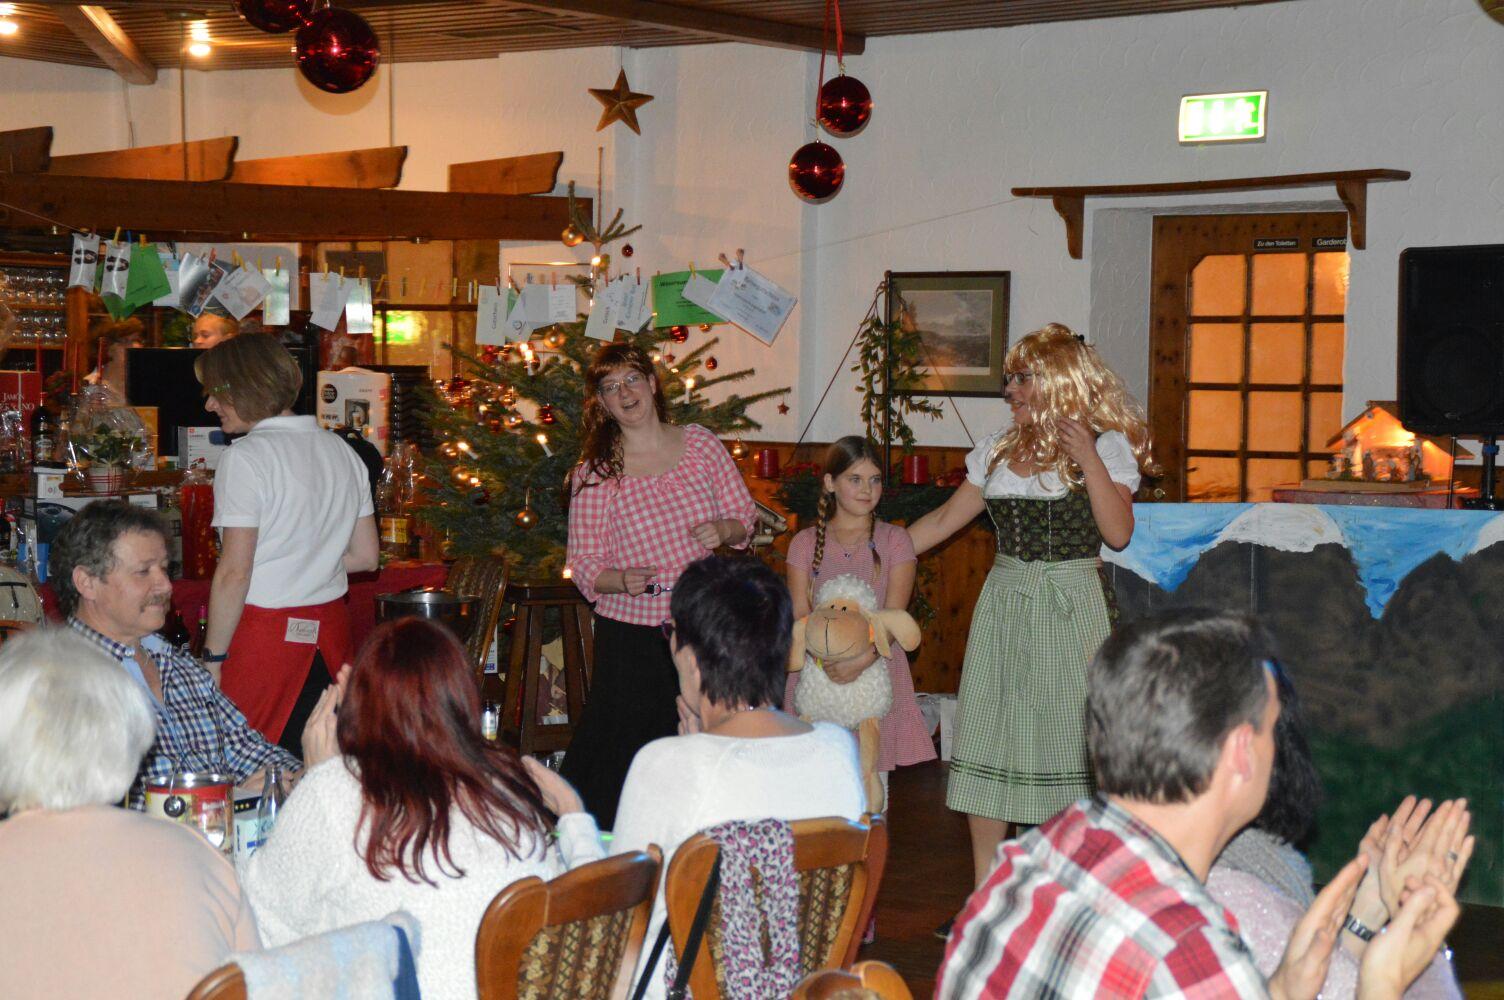 Weihnachtsfeier 2016 - Gitti & Erika